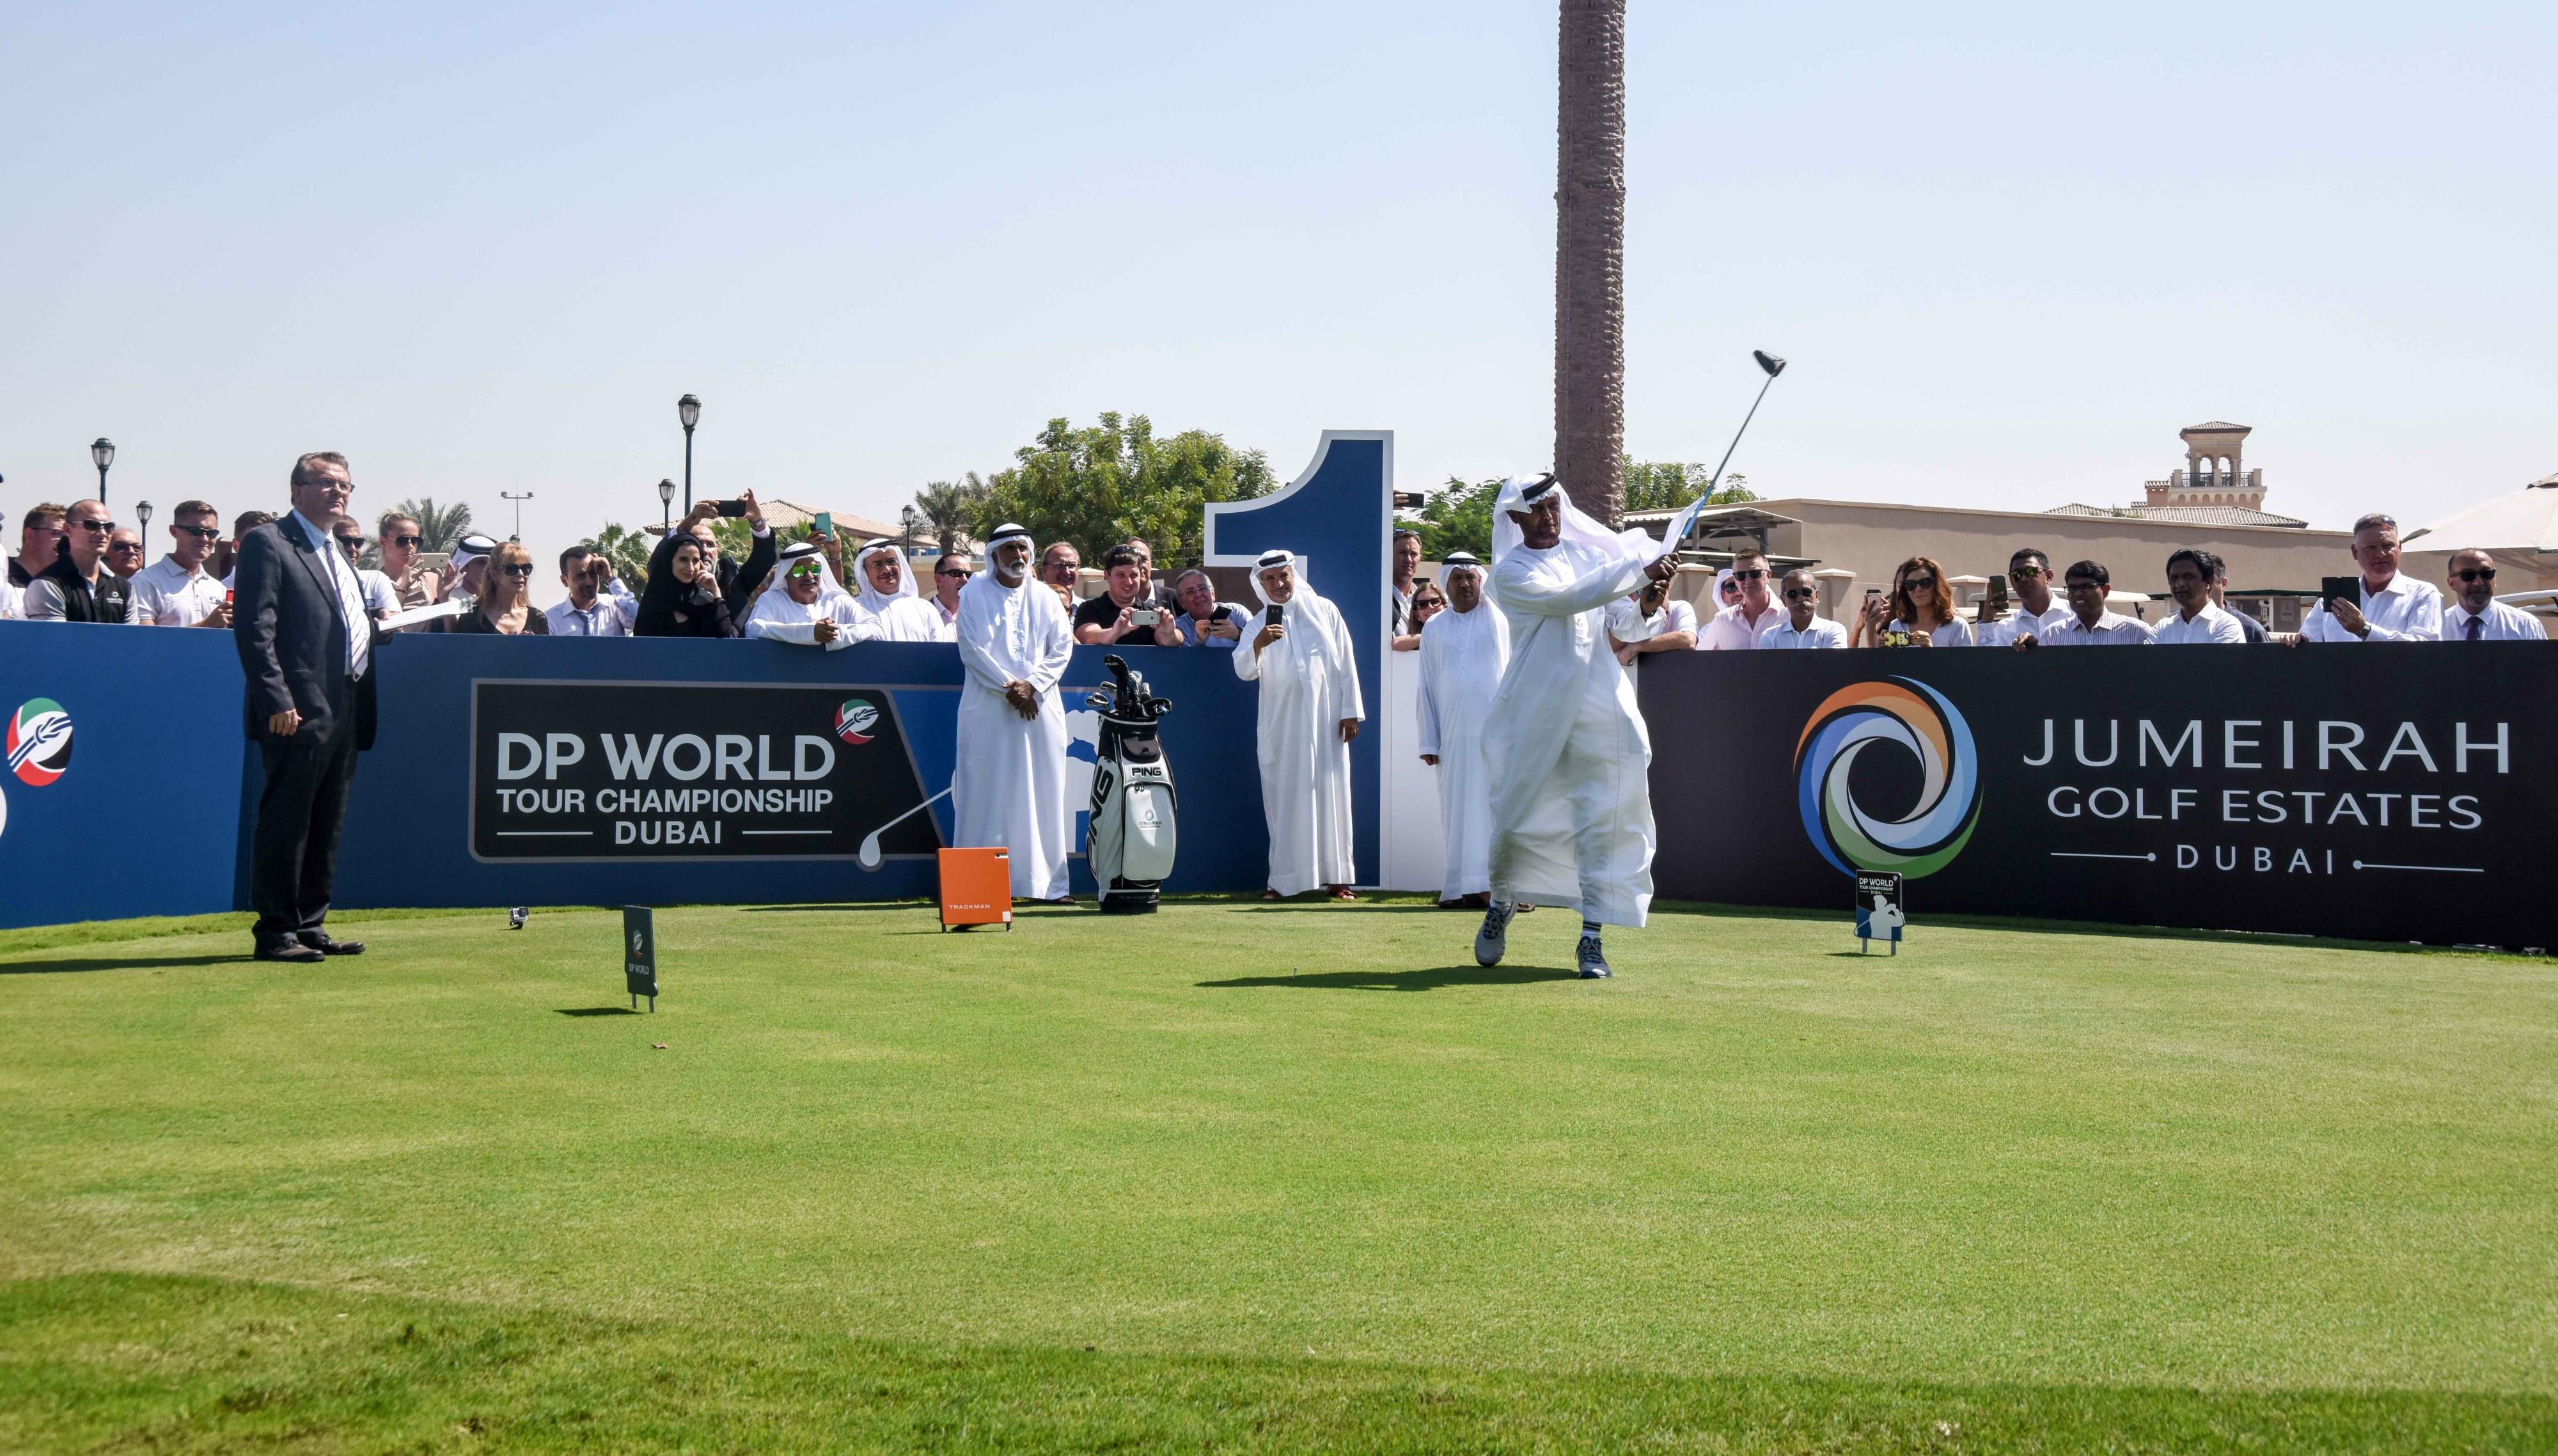 Sheikh Fahim bin Sultan Al Qasimi takes the ceremonial tee shot.